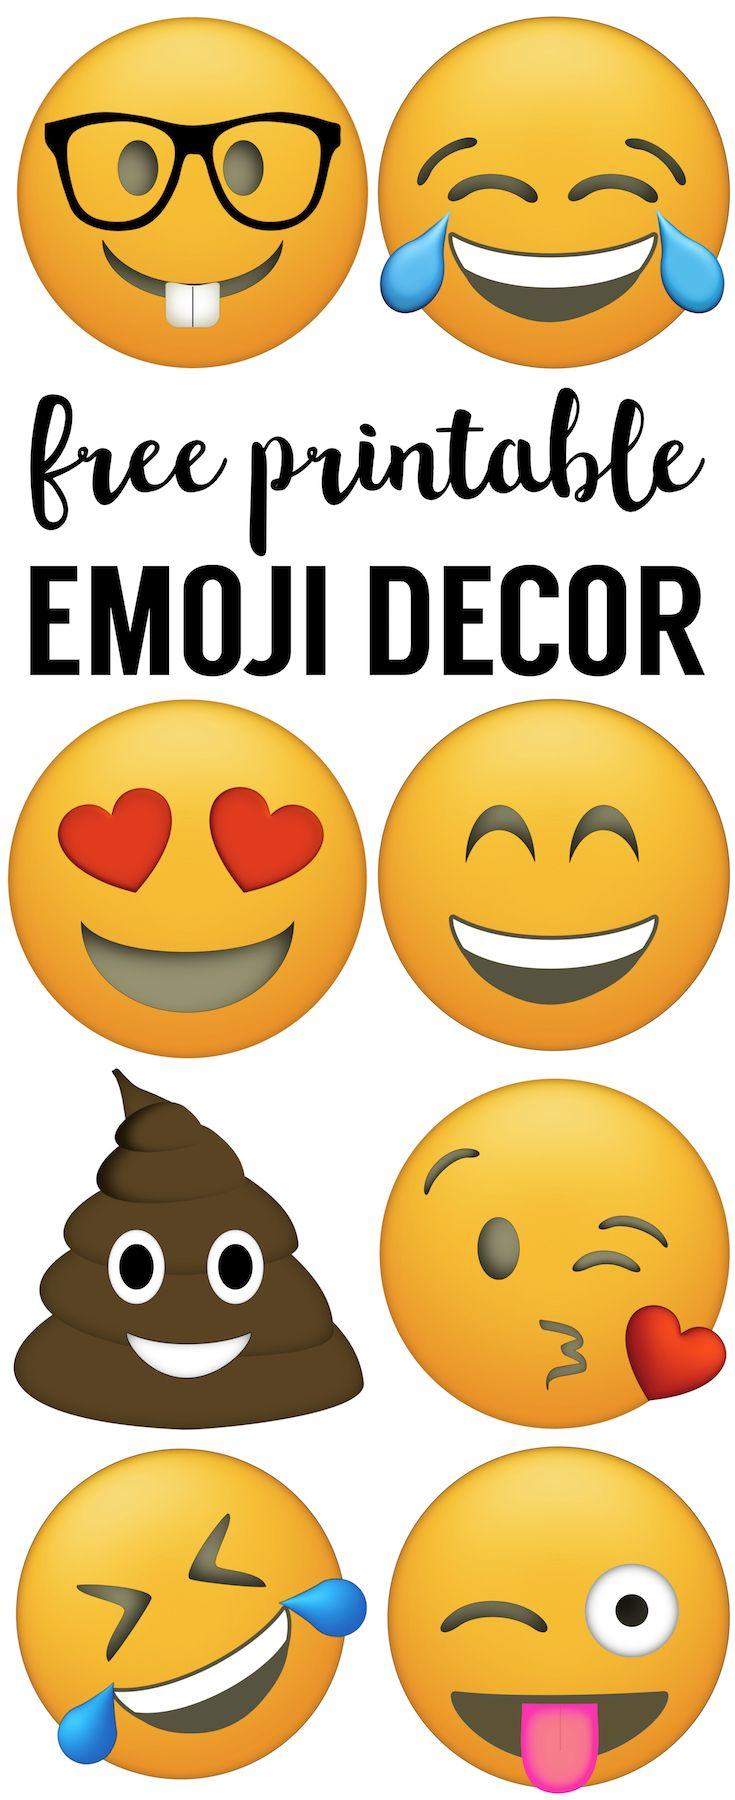 Emoji Faces Printable Free Emoji Printables Paper Trail Design Emoji Party Decorations Free Emoji Printables Emoji Party